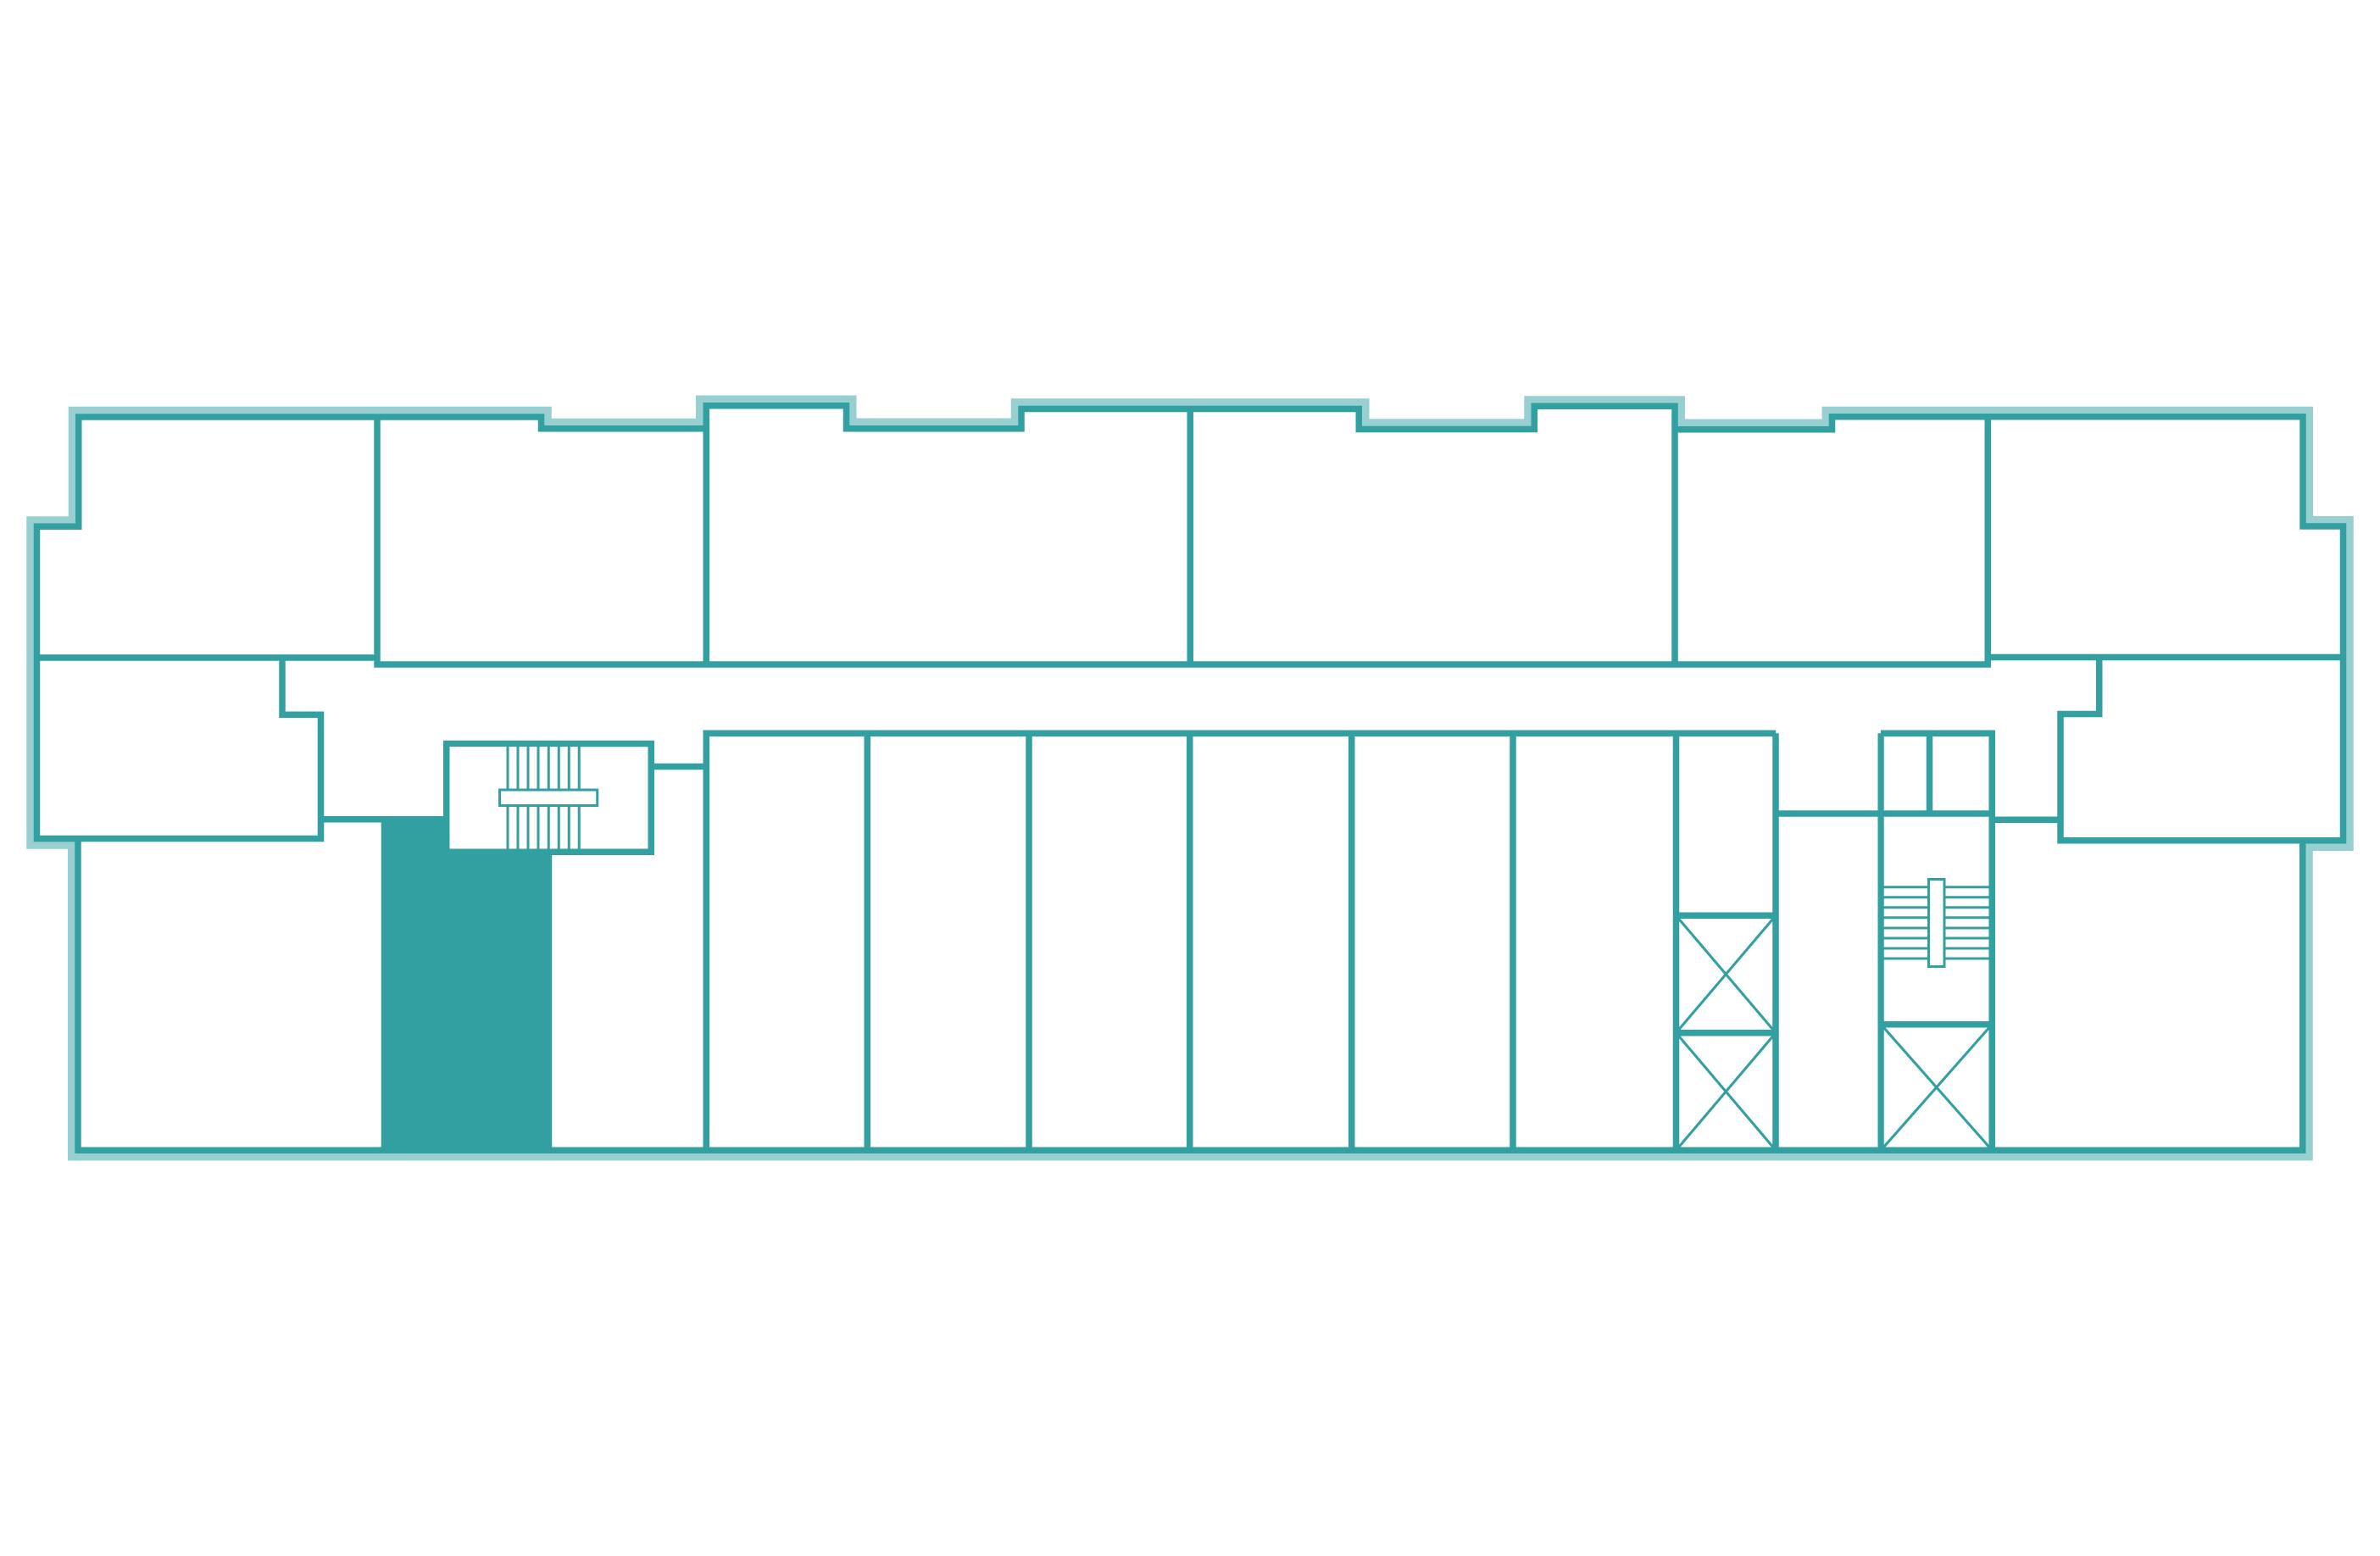 floorplan image of unit image 0808